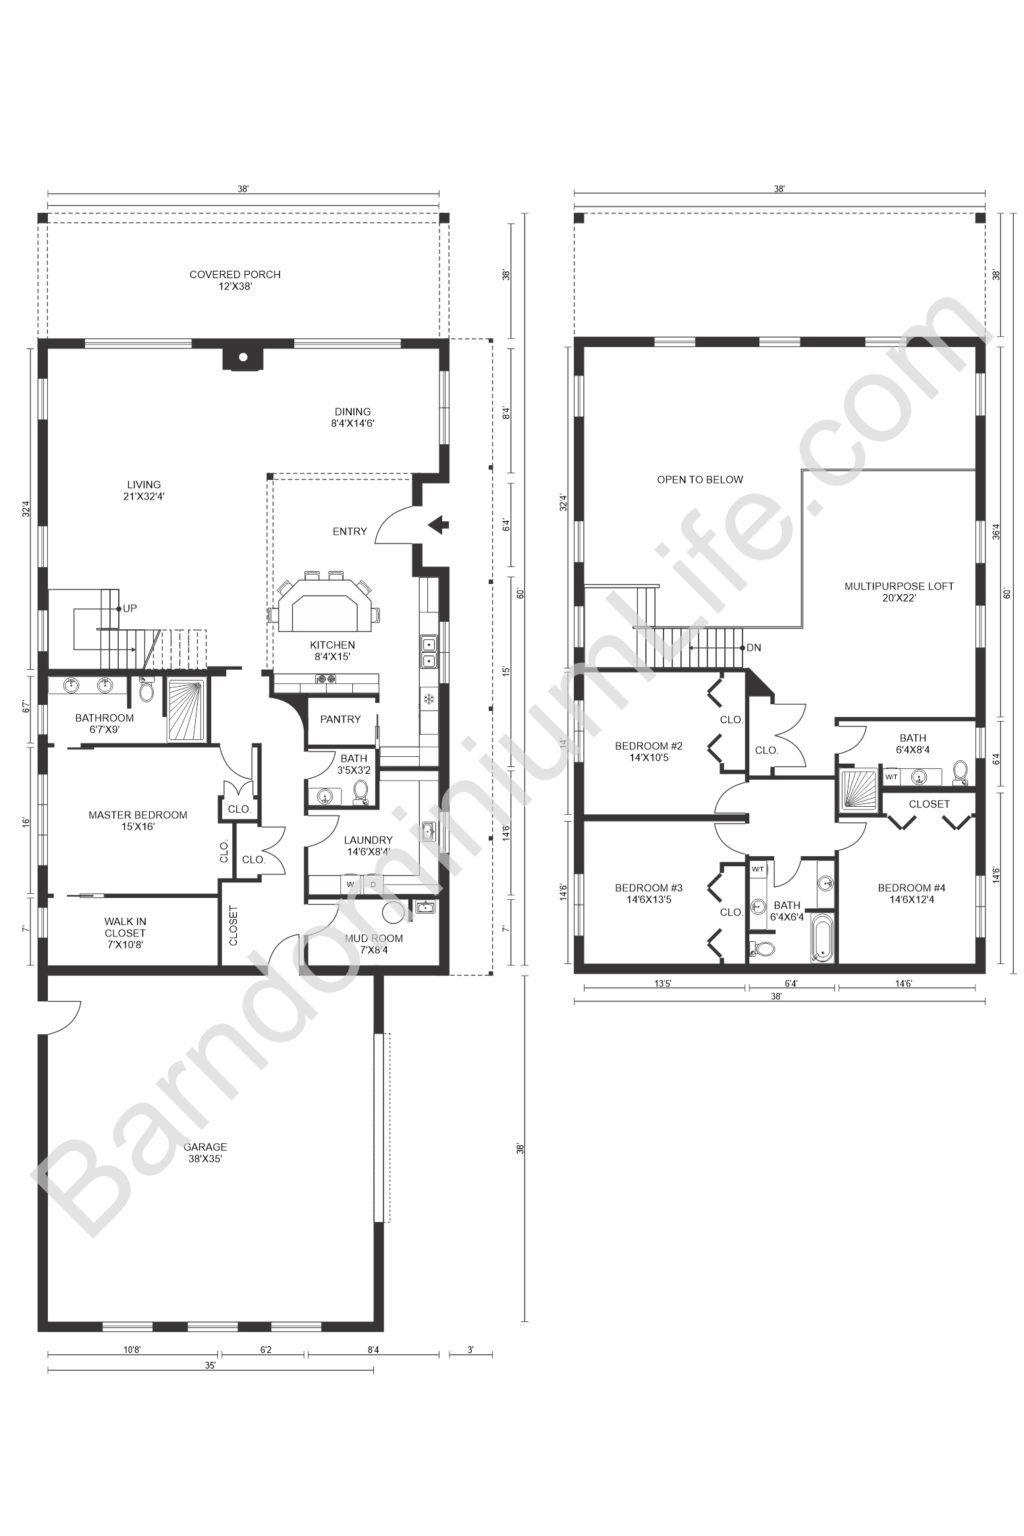 Unique Barndominium Floor Plans with Loft To Suit Any Lifestyle